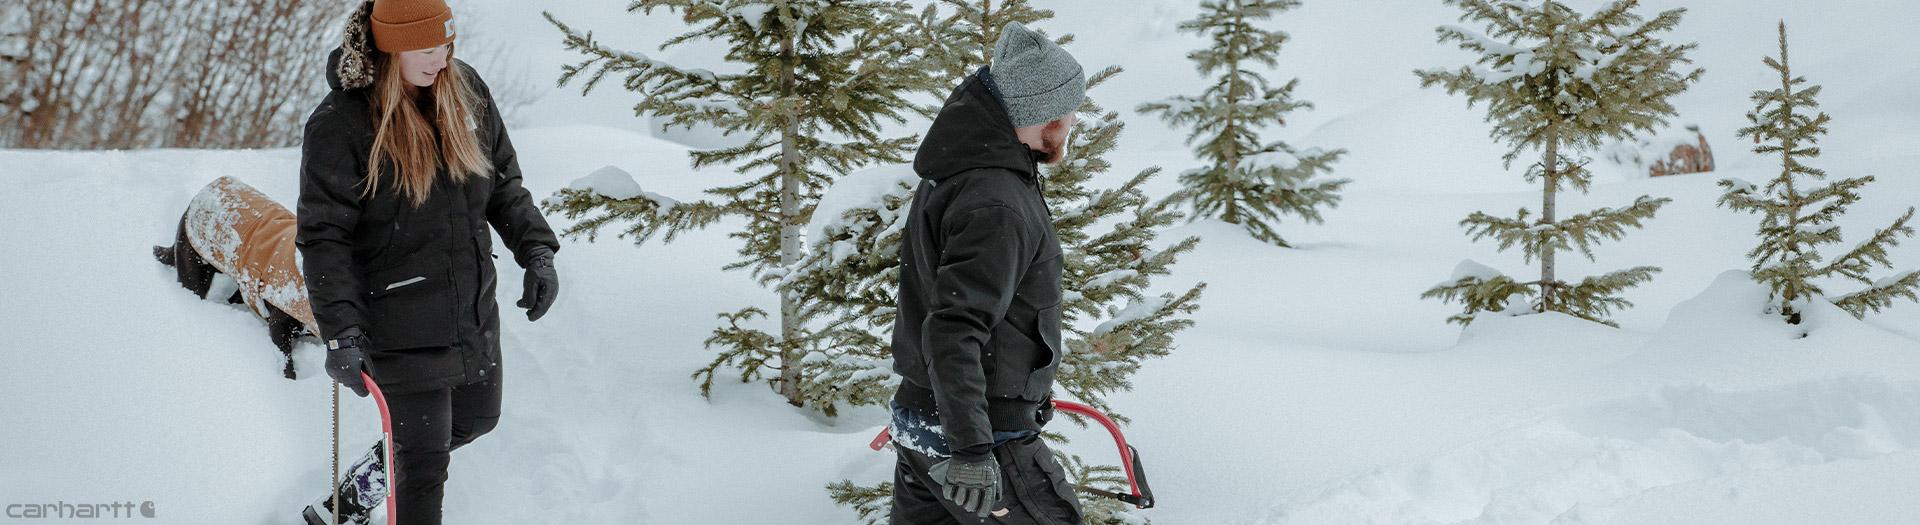 Carhartt Winter Clothing